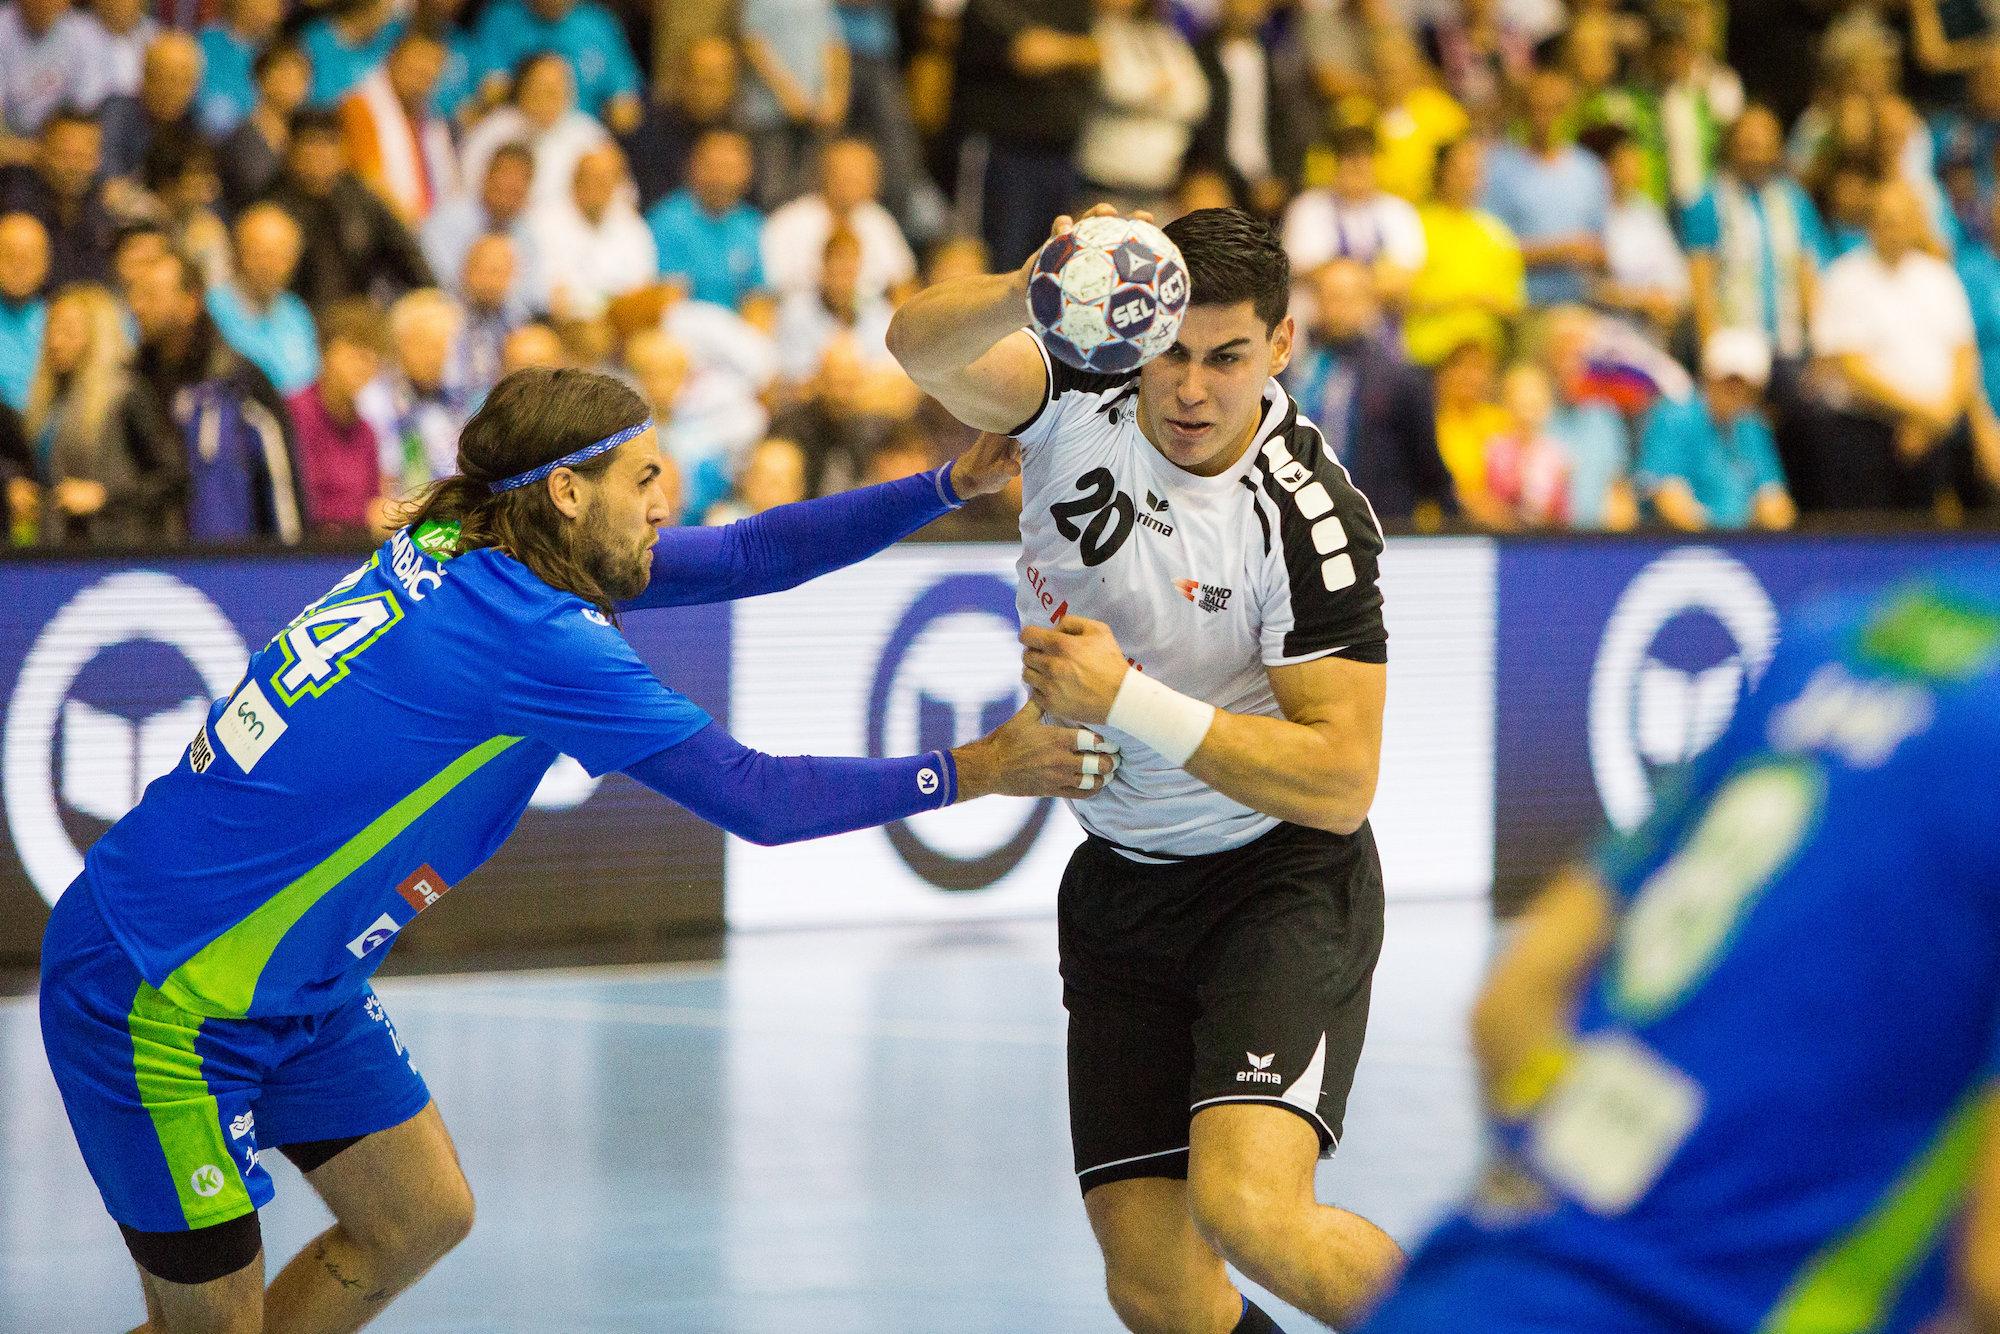 02.11.2016; Velenje; Hanball EM Qualifikation 2018 - Slowenien - Schweiz; Luka Maros (SUI) (Ziga Zupan/Expa/freshfocus)